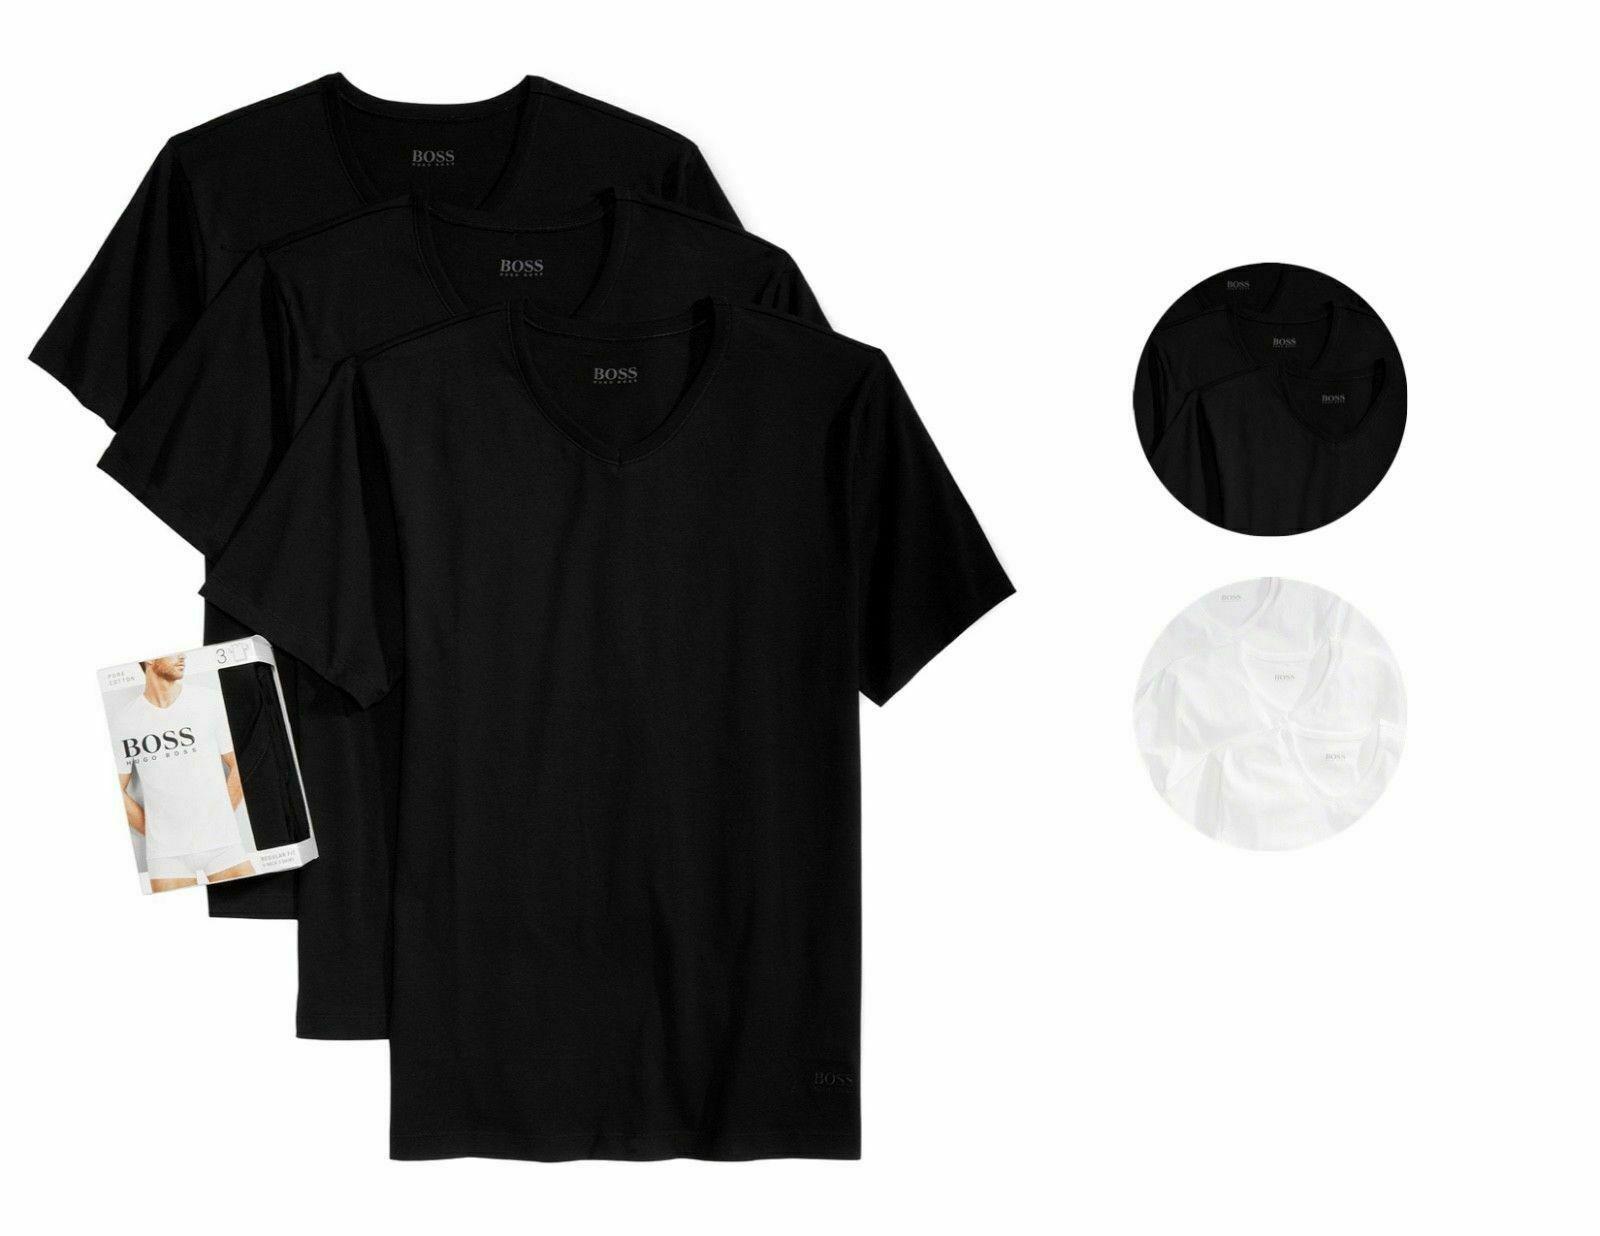 Hugo Boss Men's 3 Pack Pure Cotton Regular Fit V-Neck Shirt T-Shirt 50325386